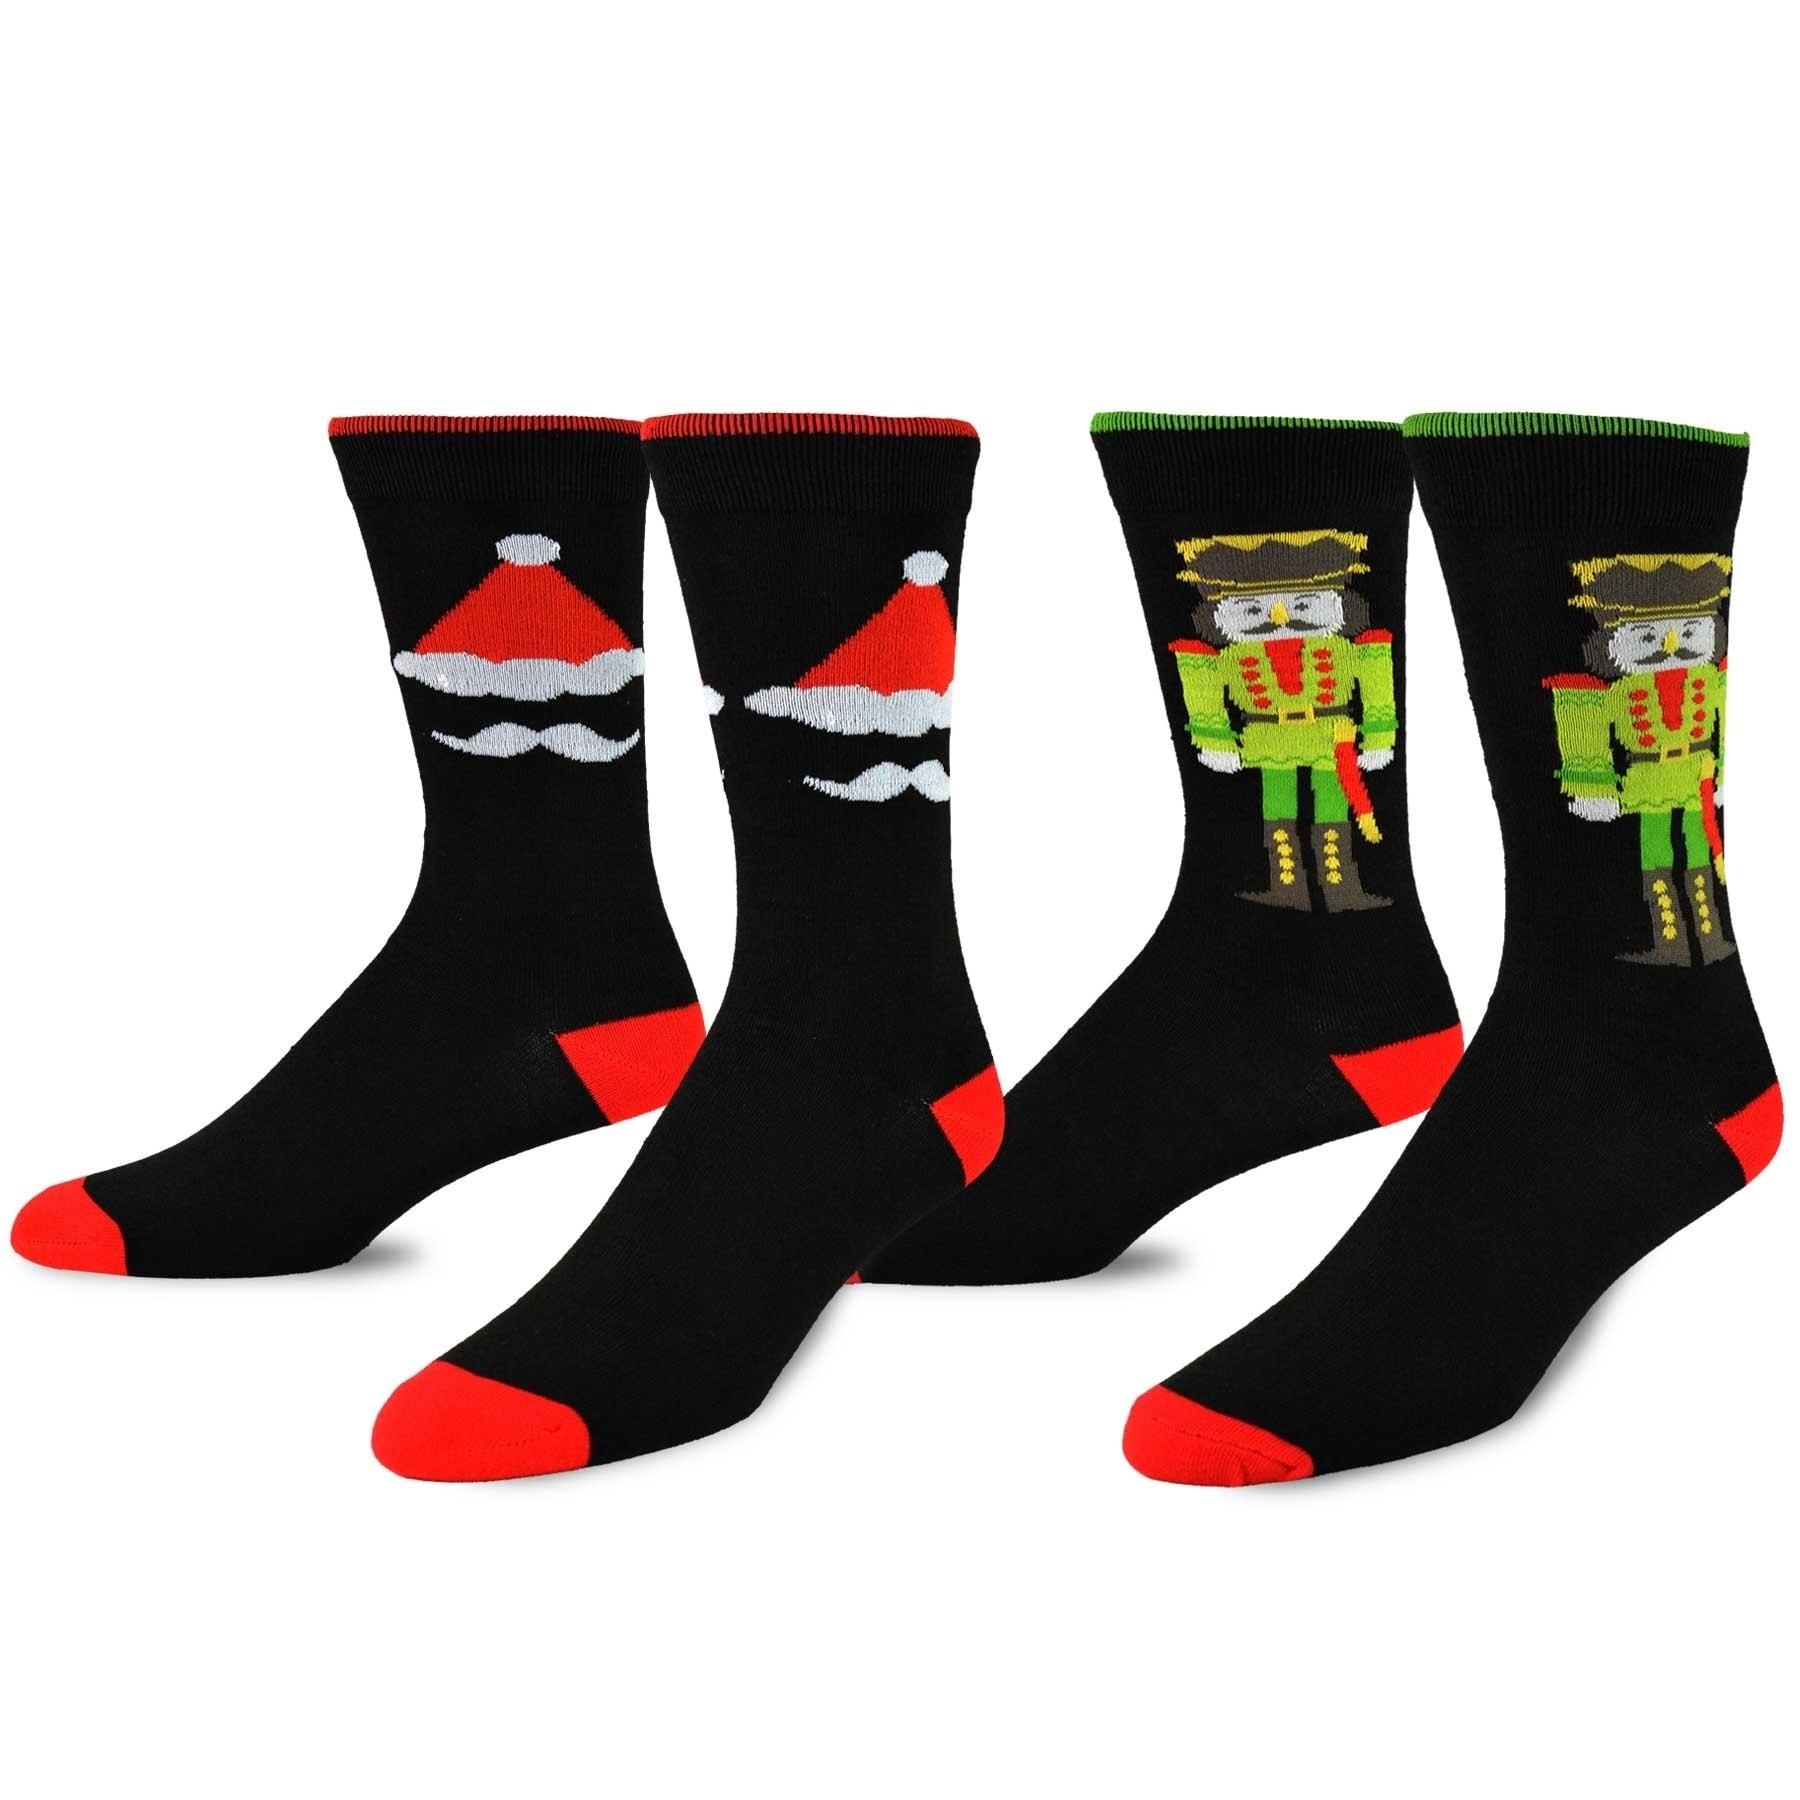 TeeHee Novelty Cotton Fun Crew Socks 6-Pack for Men